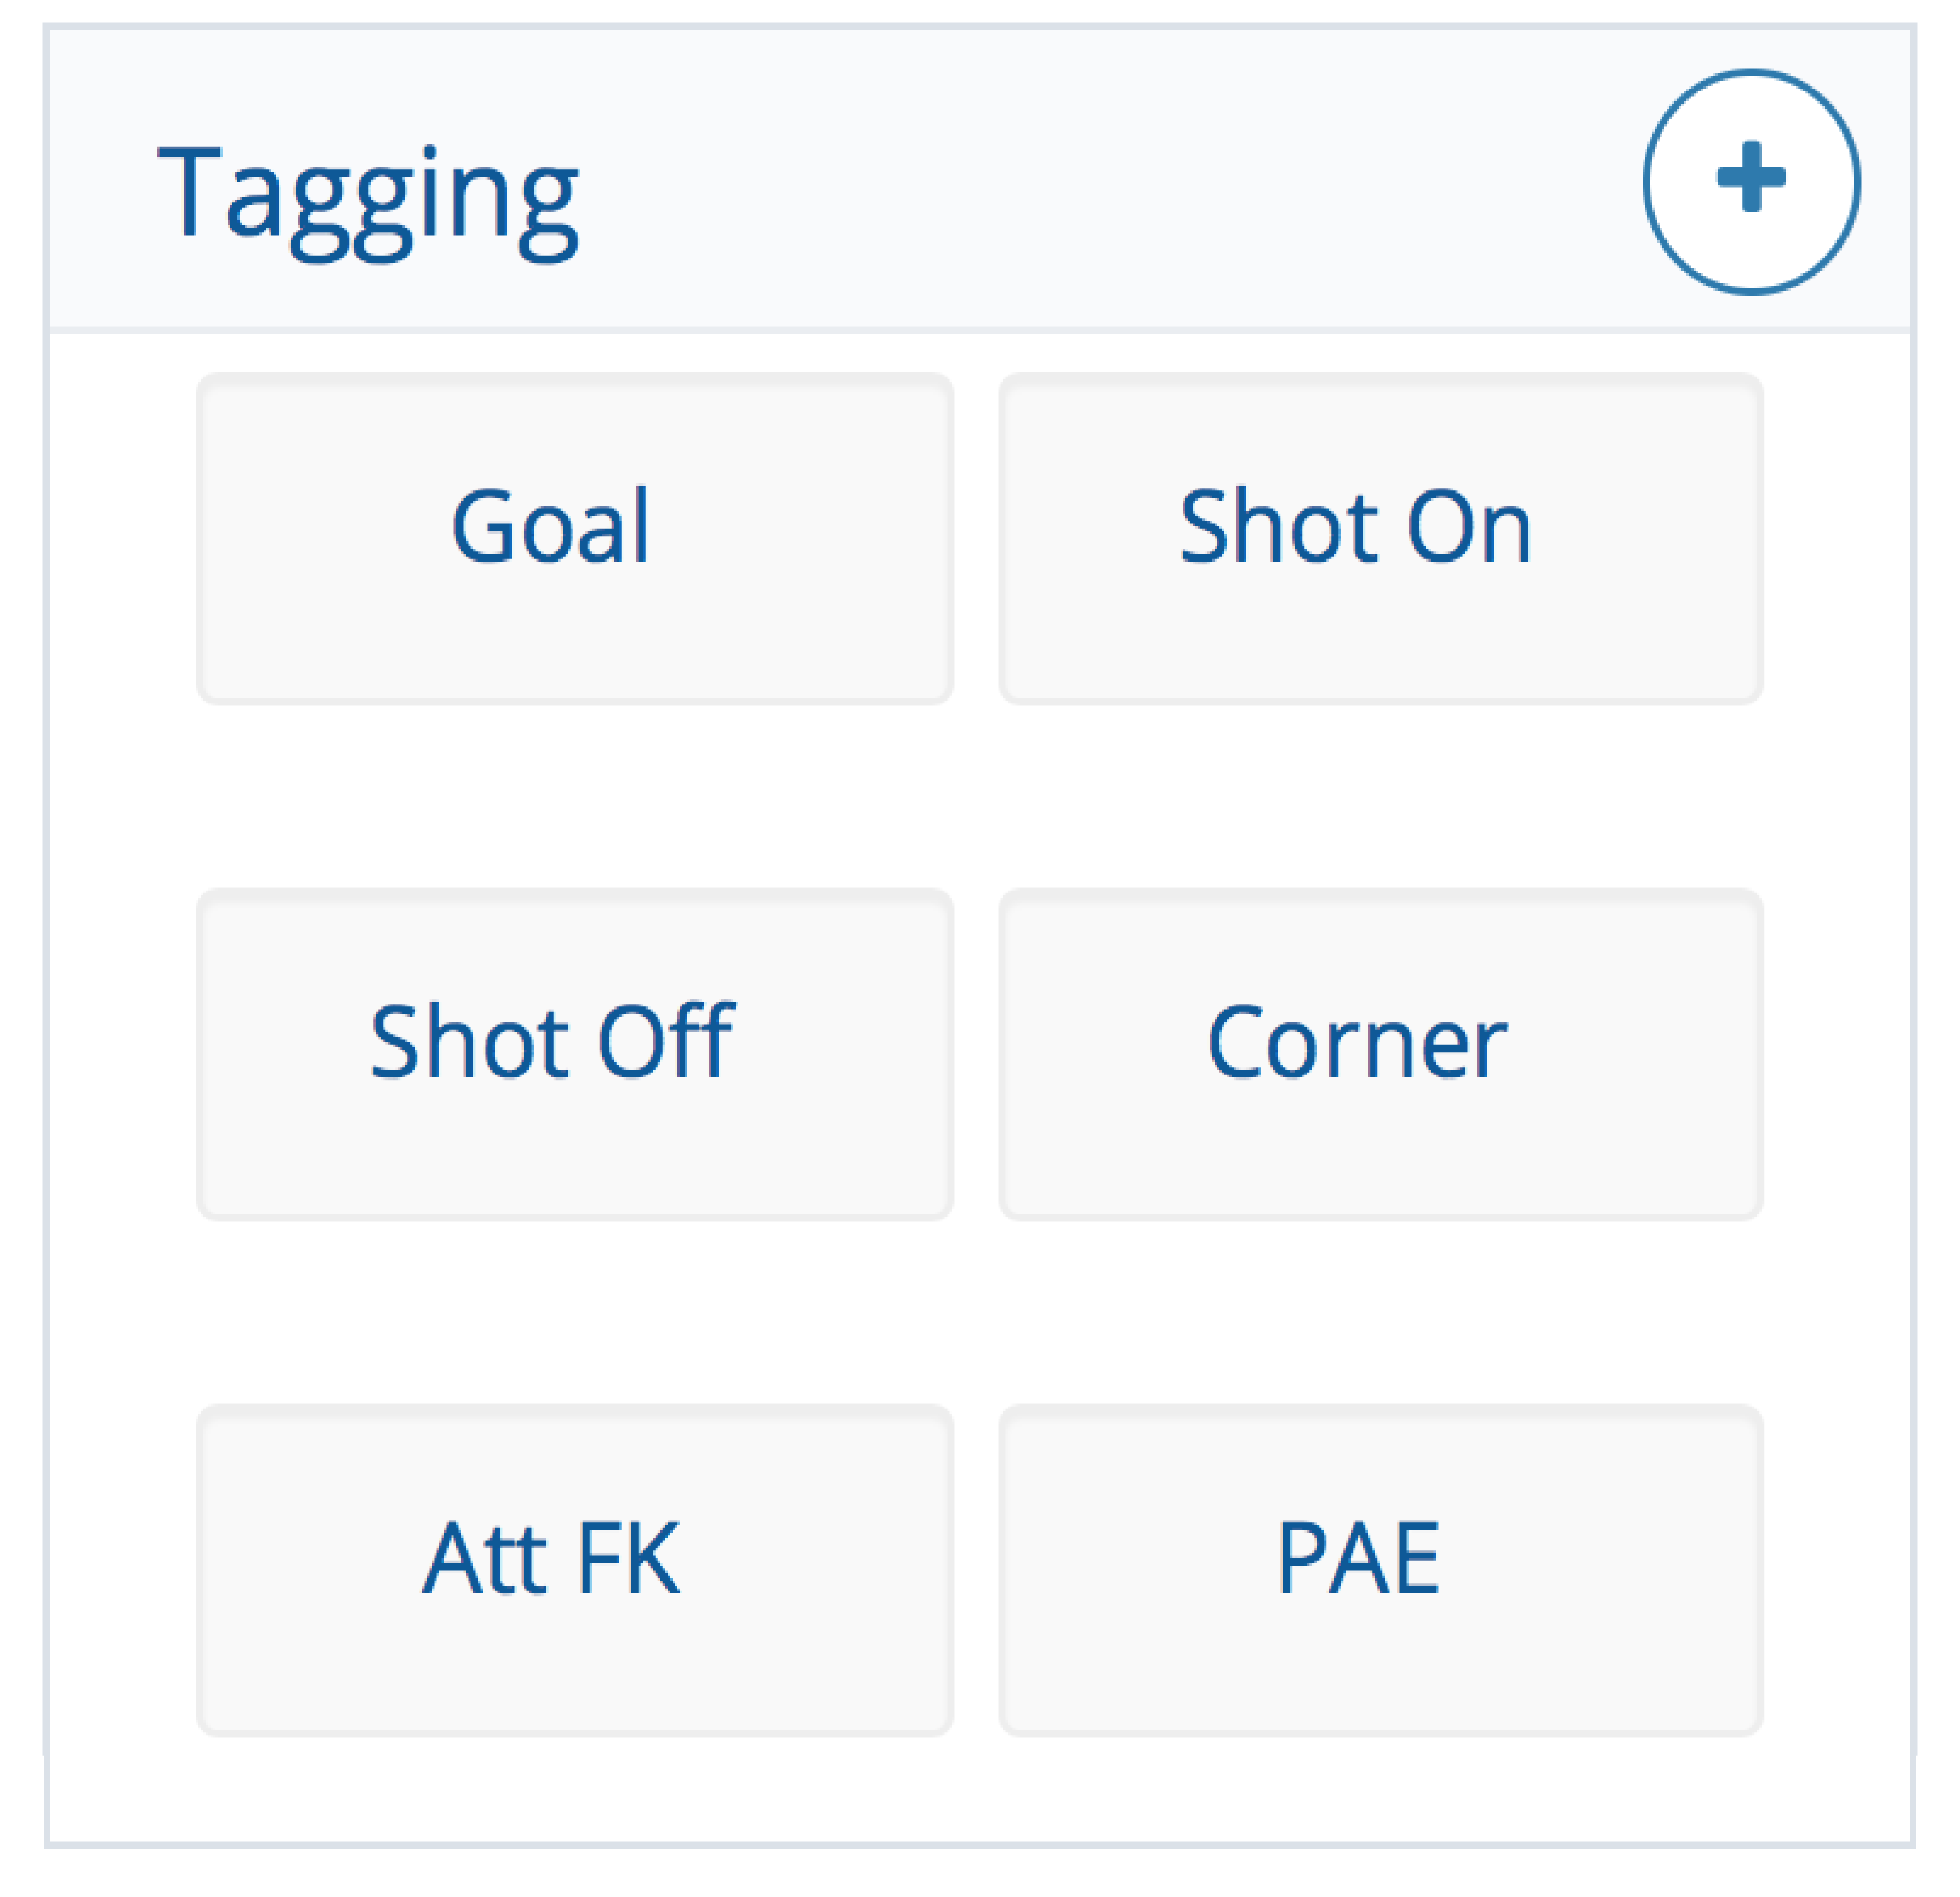 Football Tagging Panel